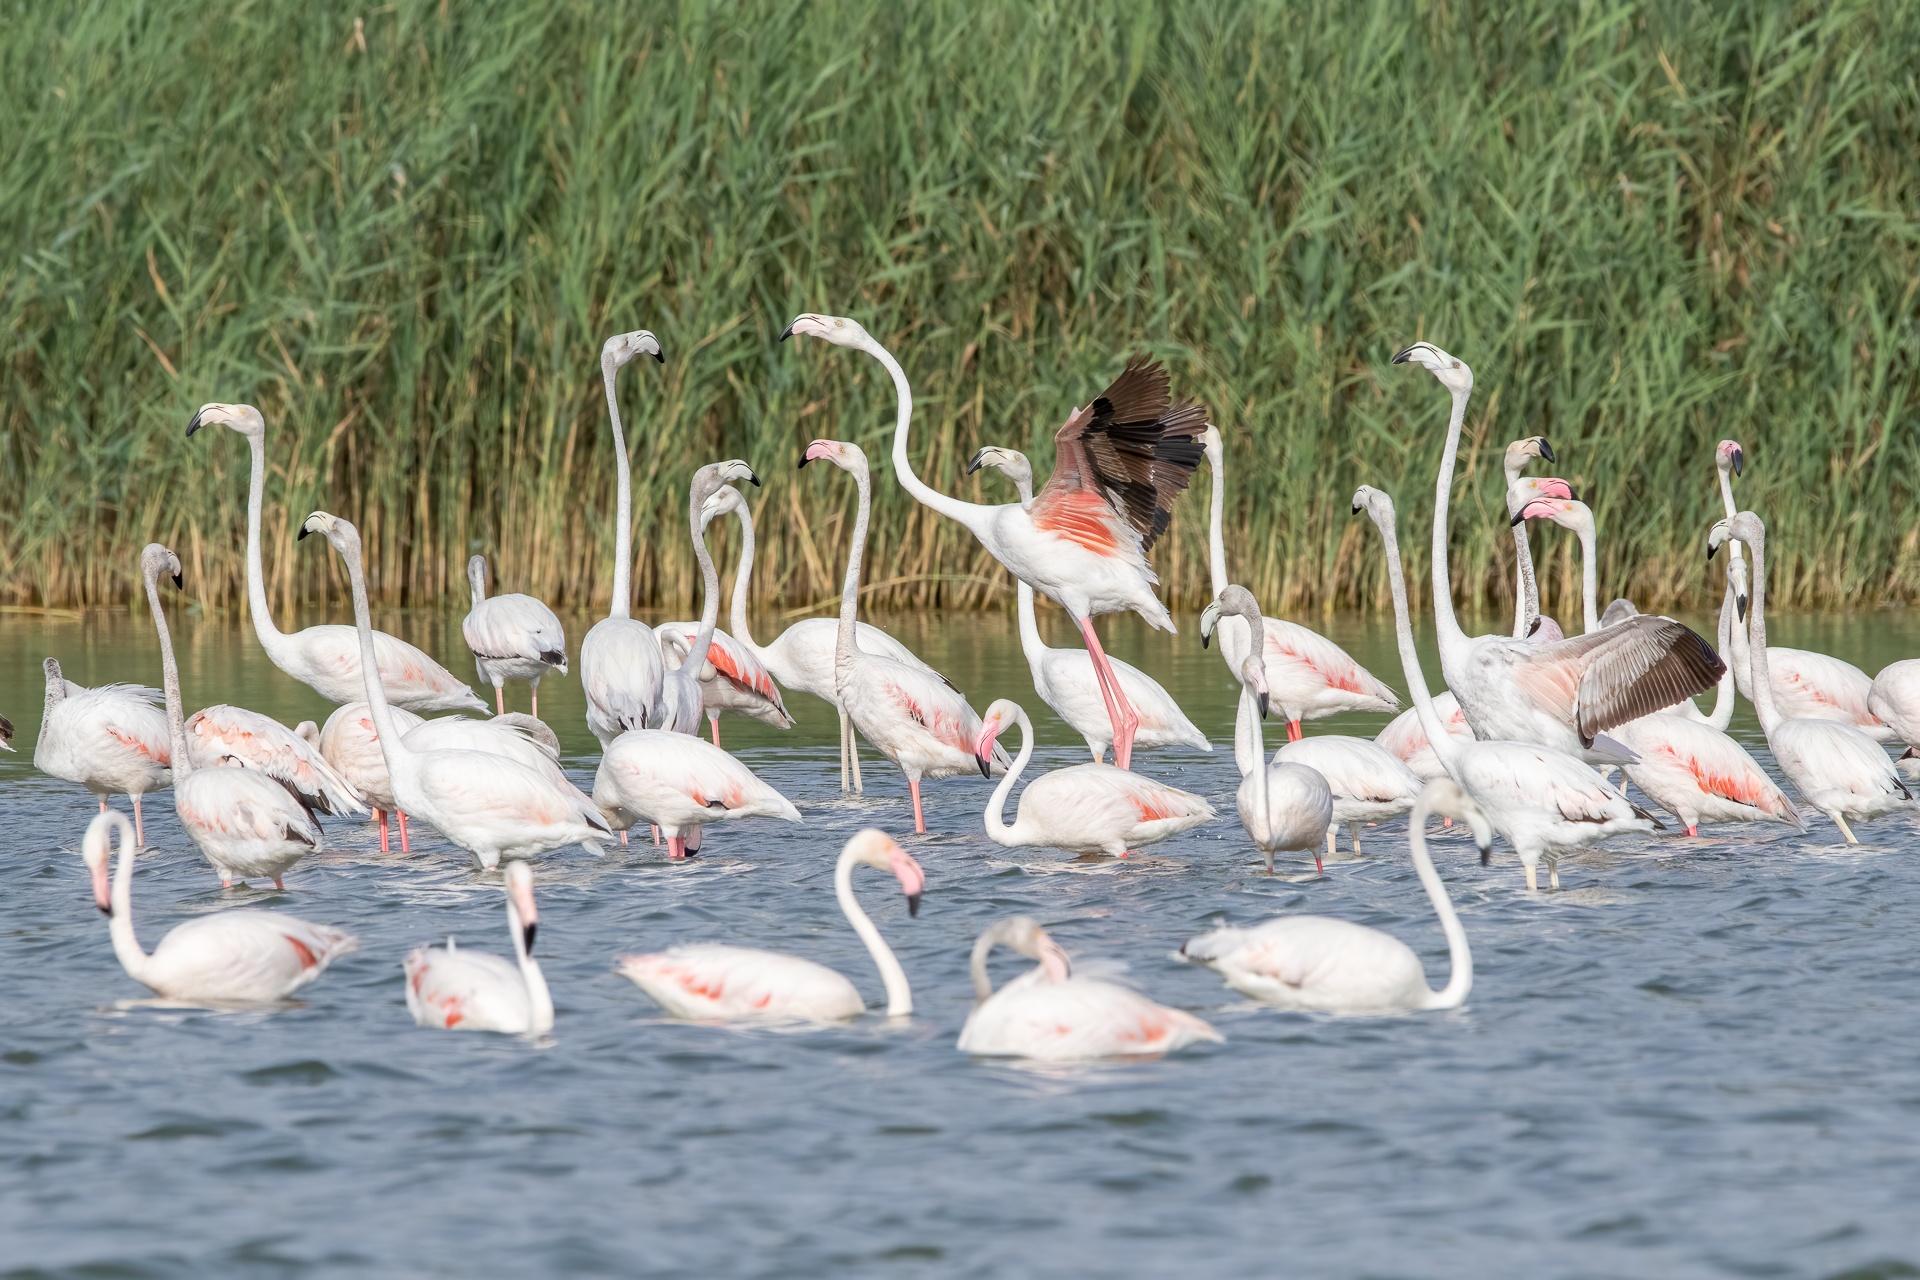 Flamingo morning activities